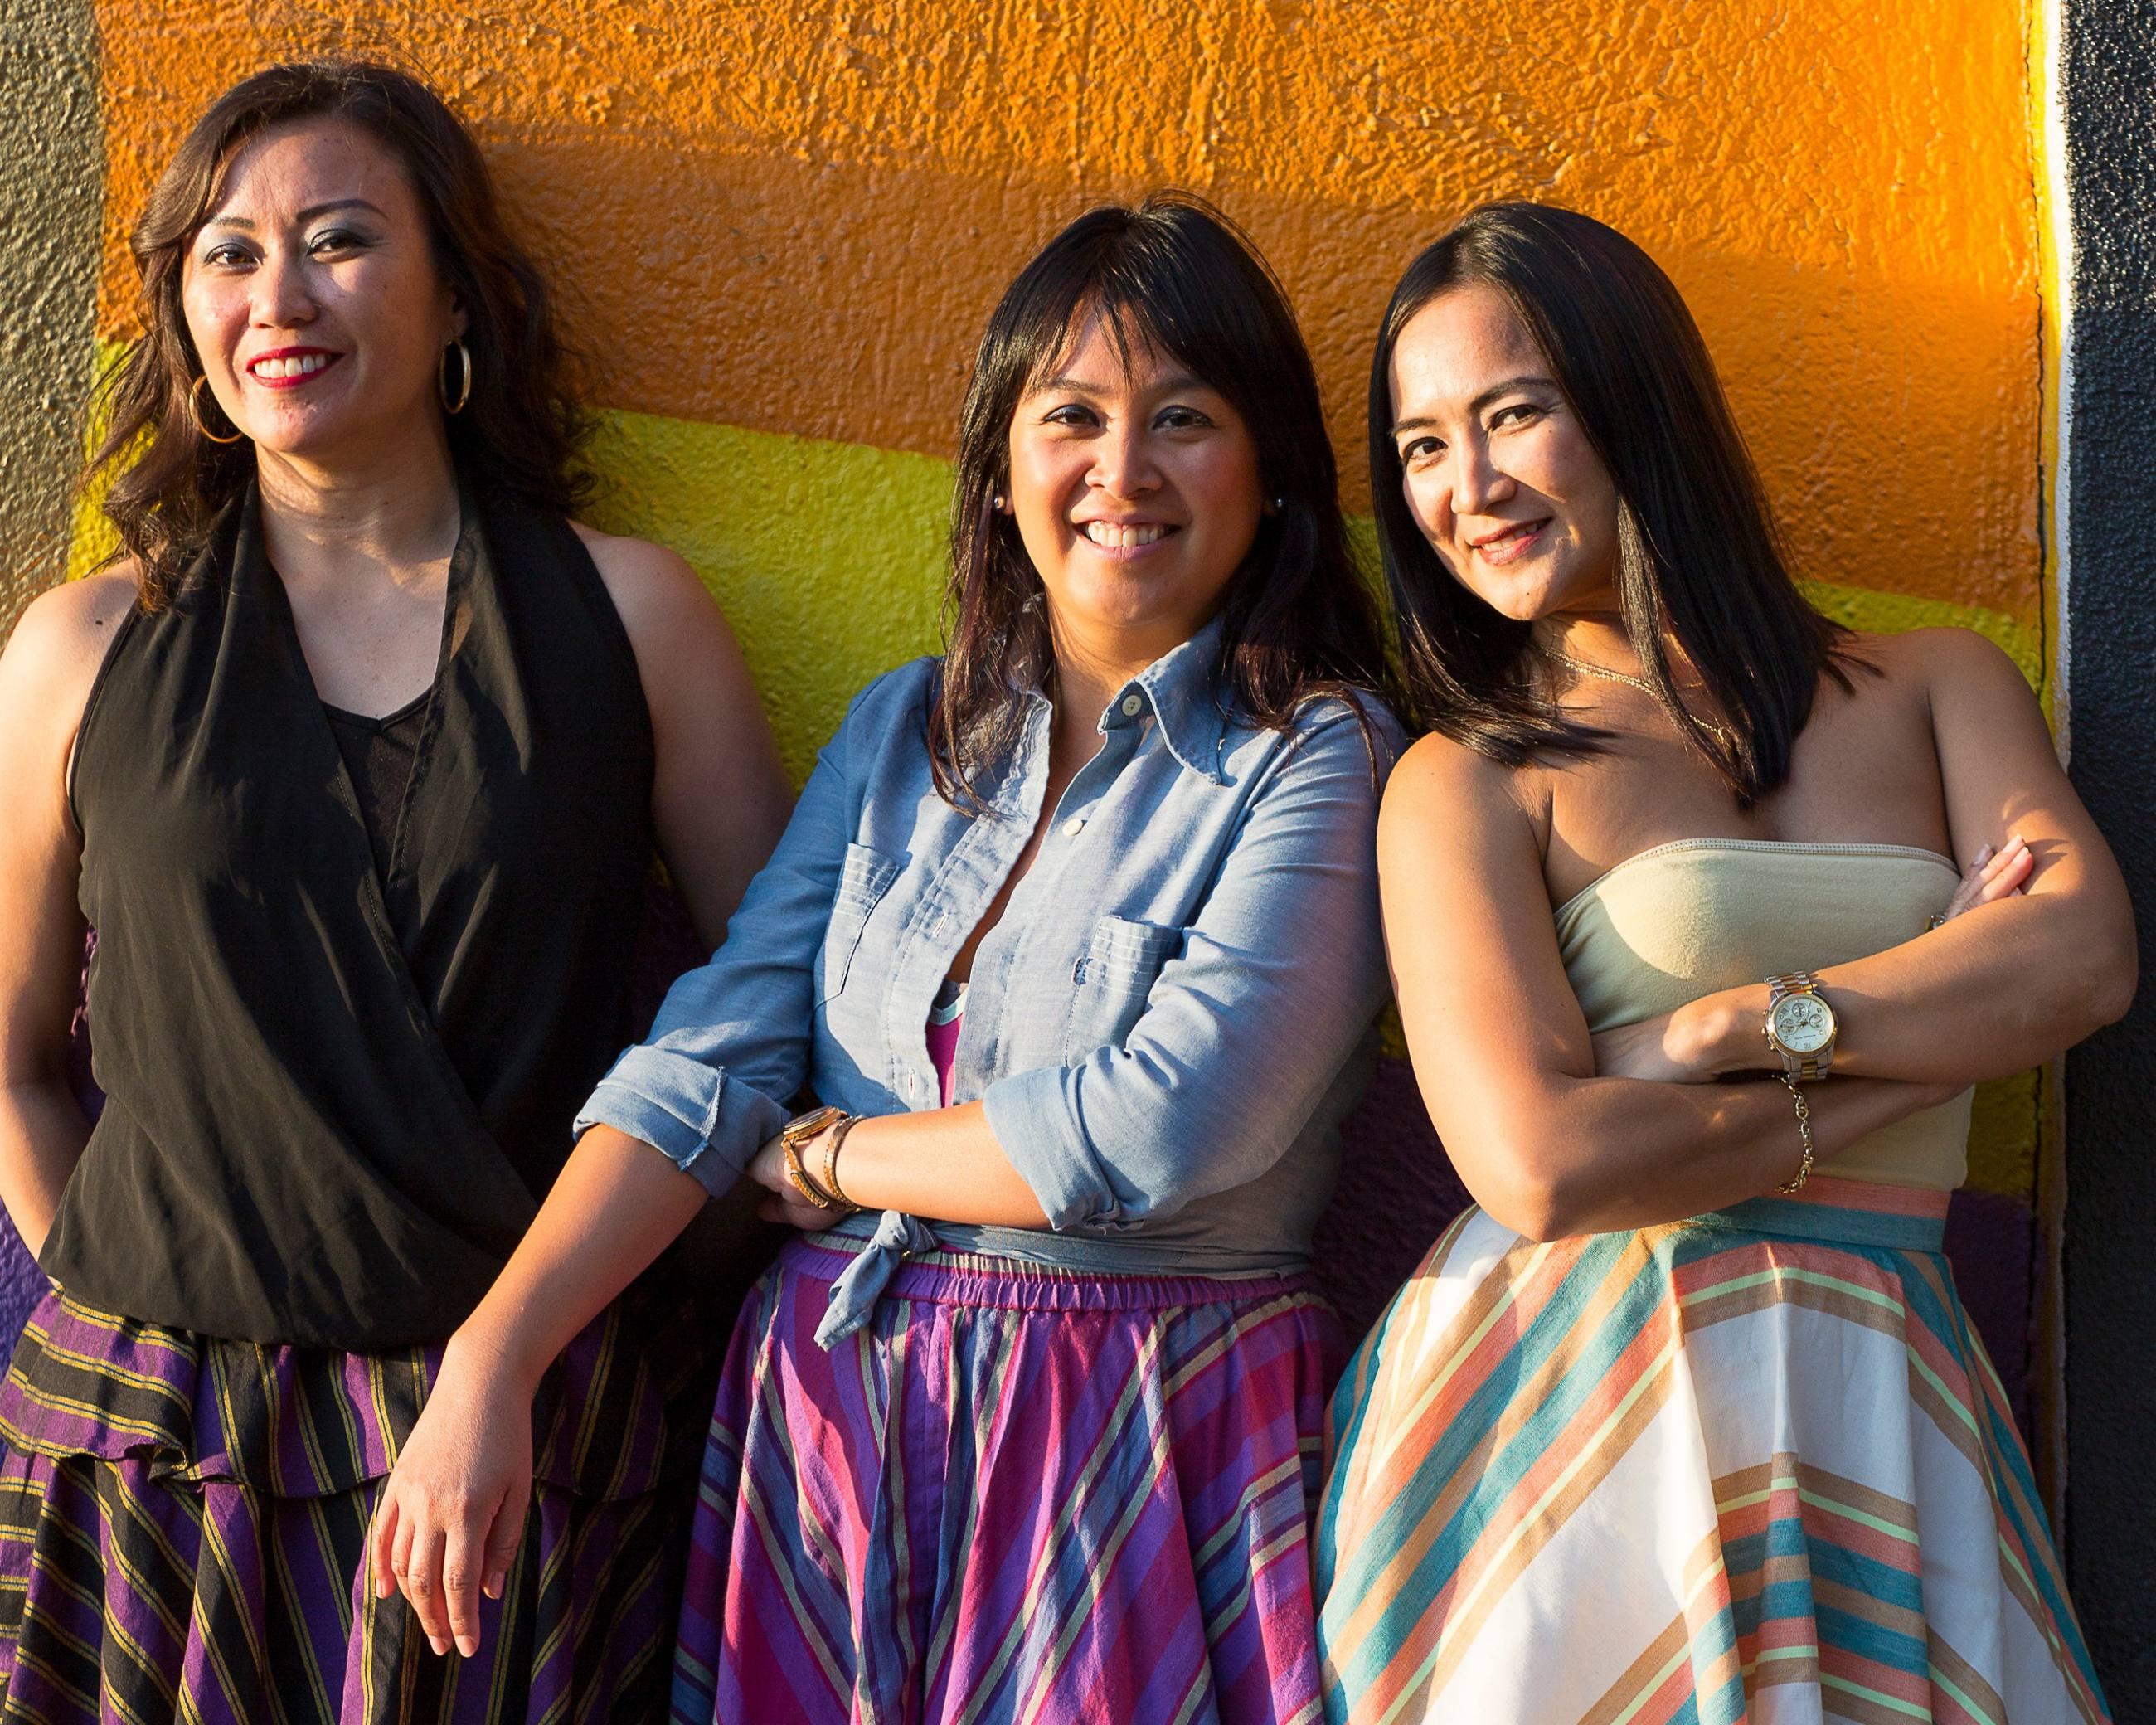 Genever owners Patricia Perez, Roselma Samala, and Christine Sumiller